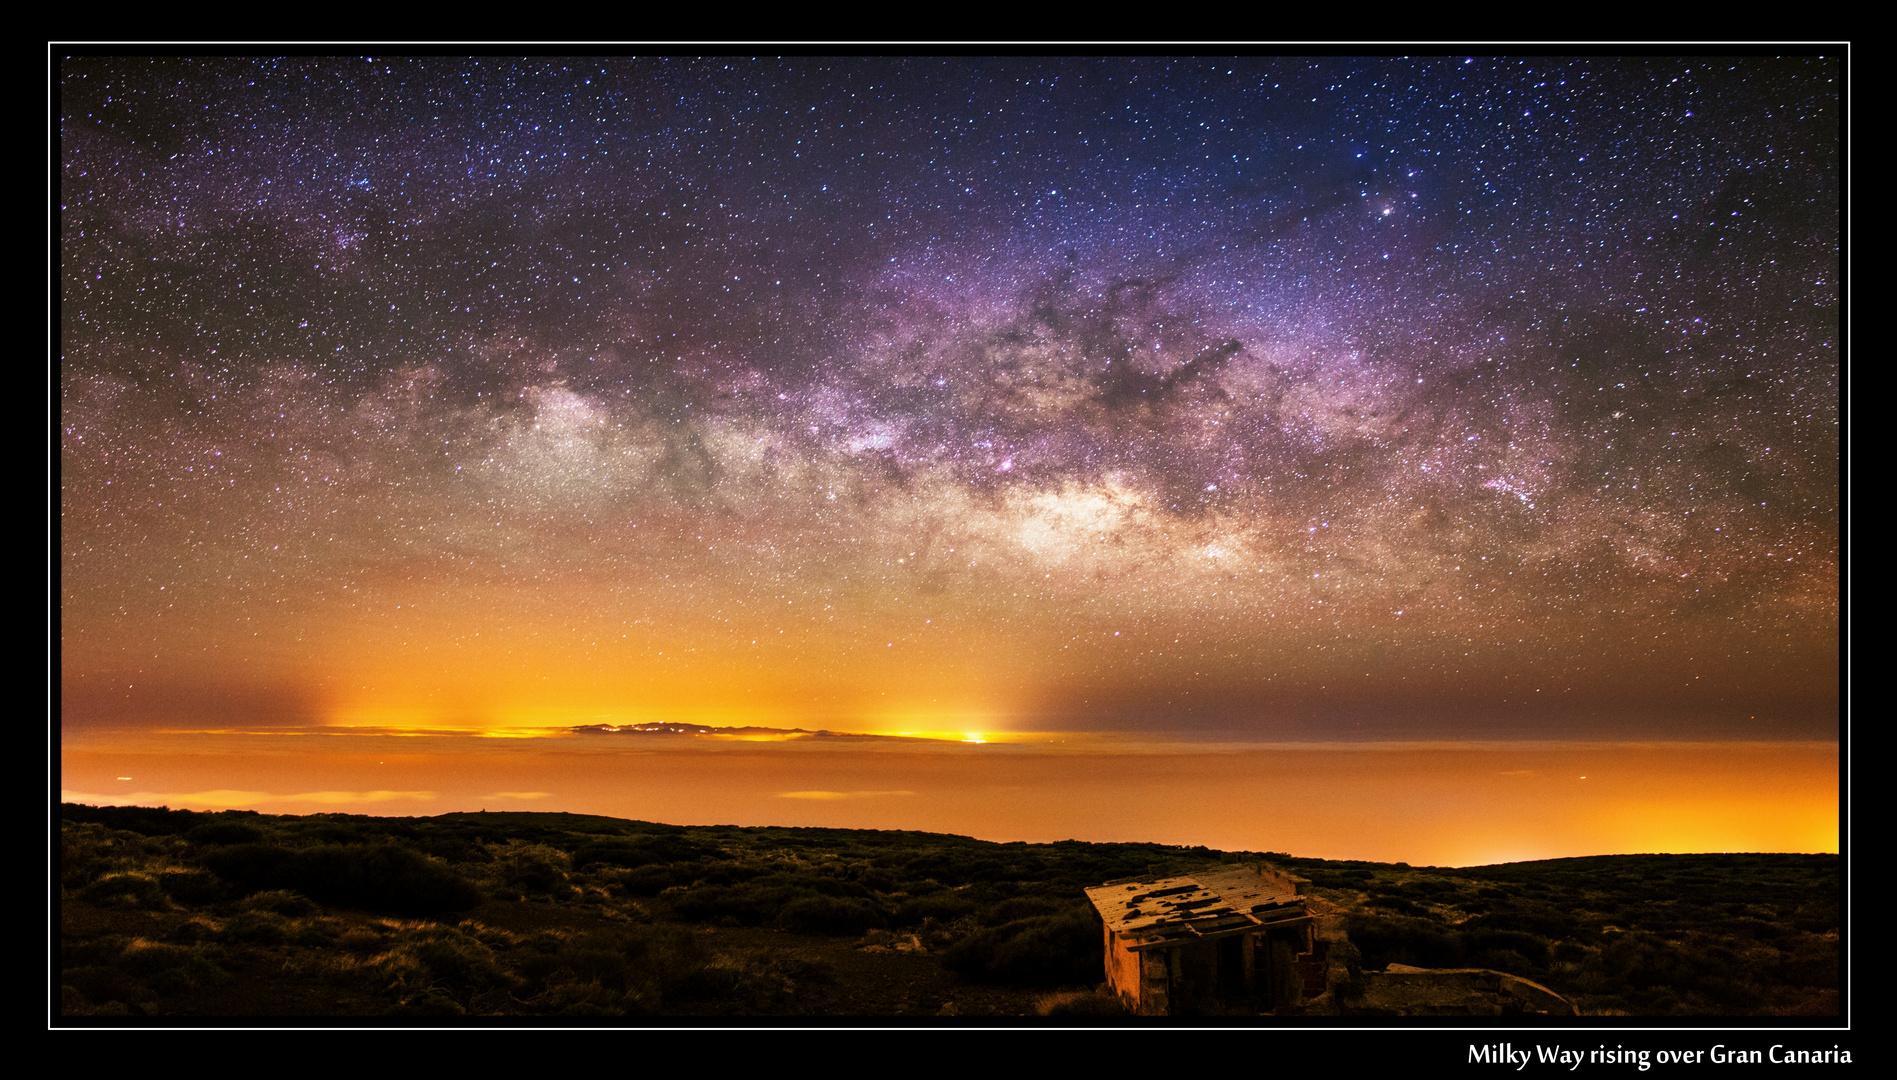 Milky Way rising over Gran Canaria